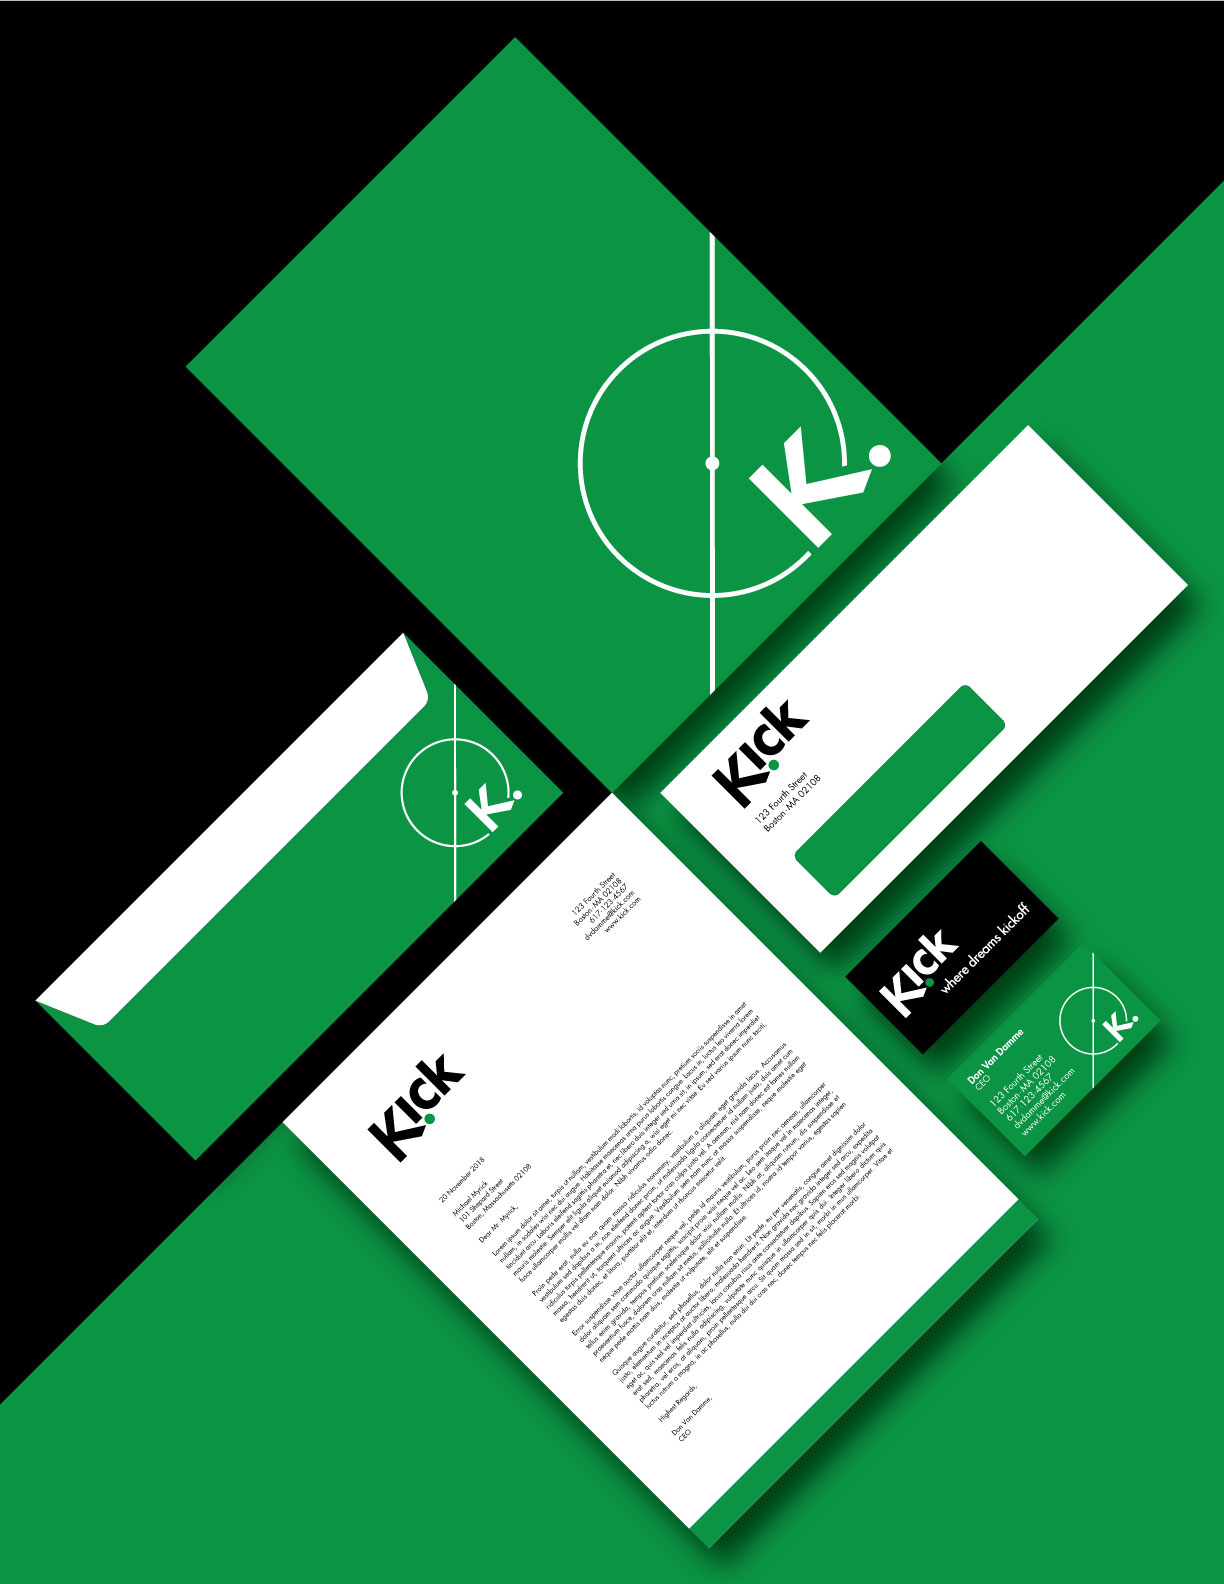 Kick Brand Identity Stationery Suite